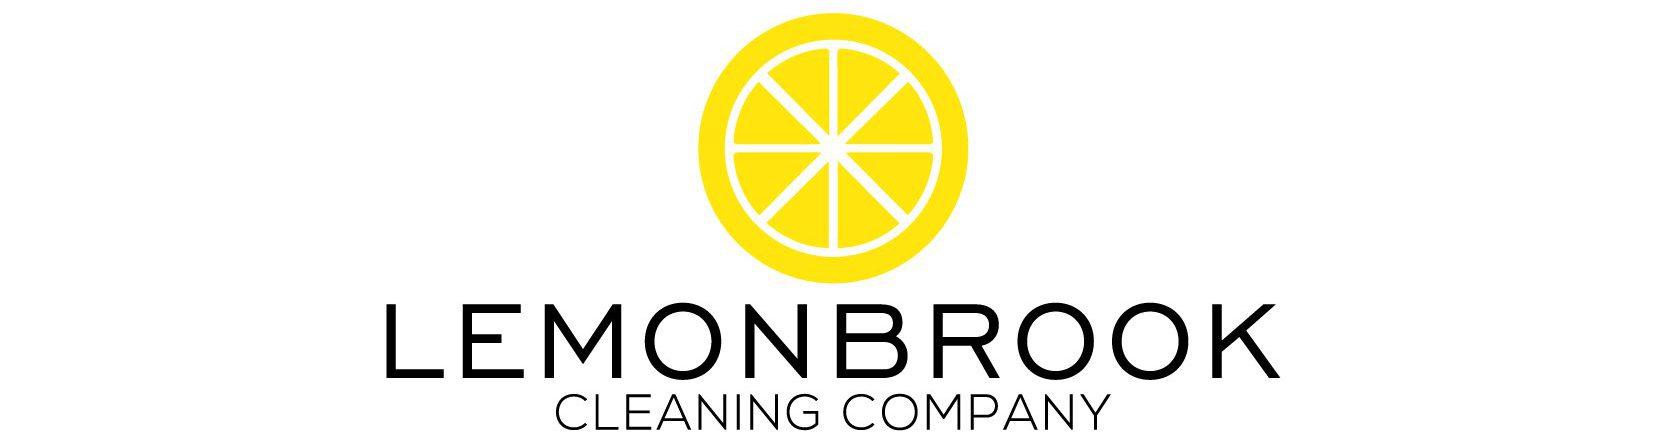 Lemonbrook Cleaning Company